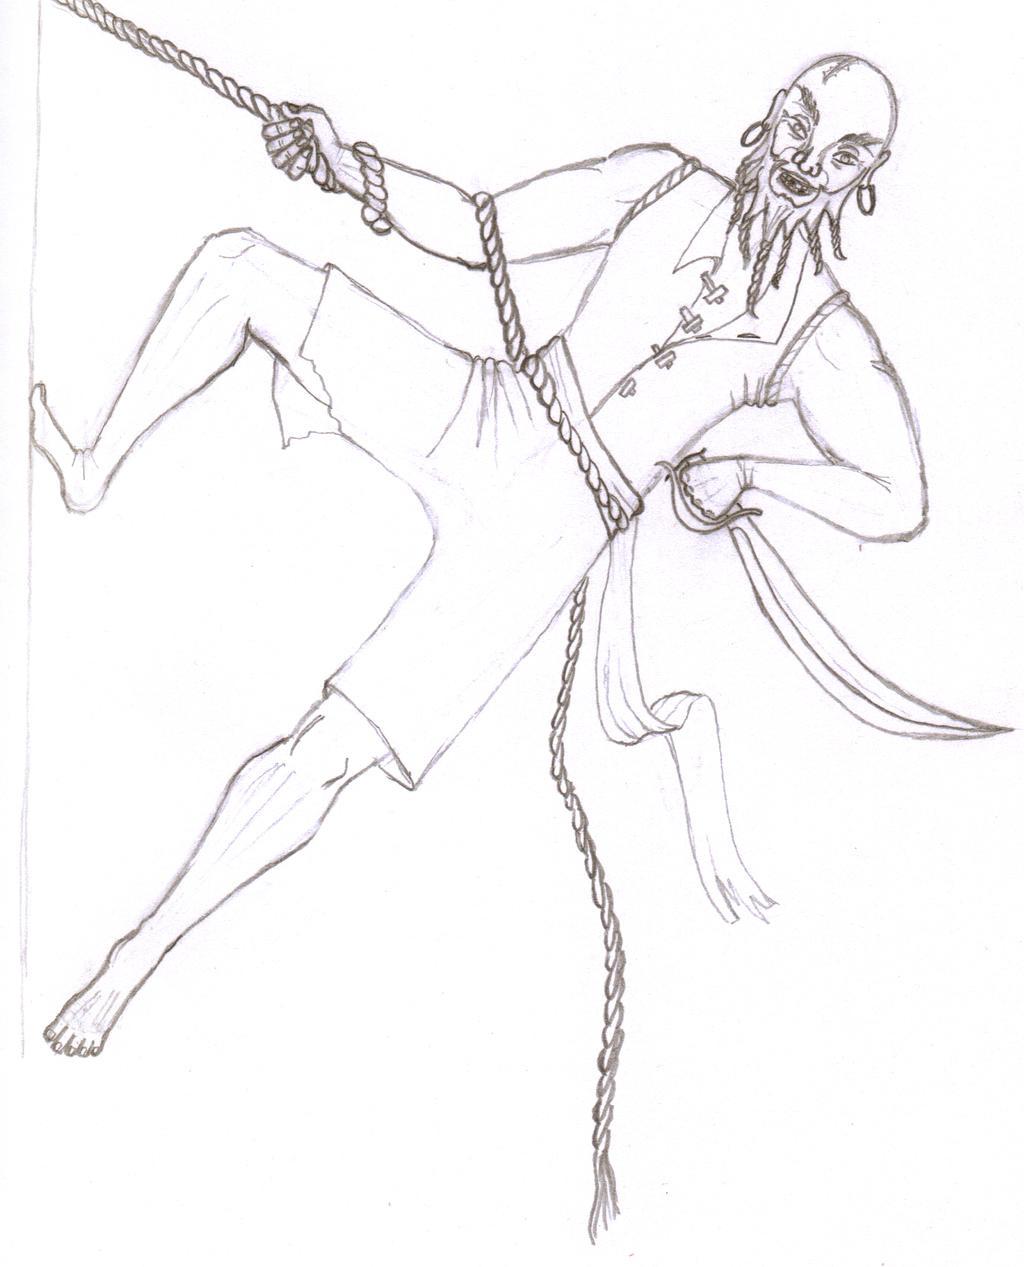 Swingin' Pirate by scetxr-efx